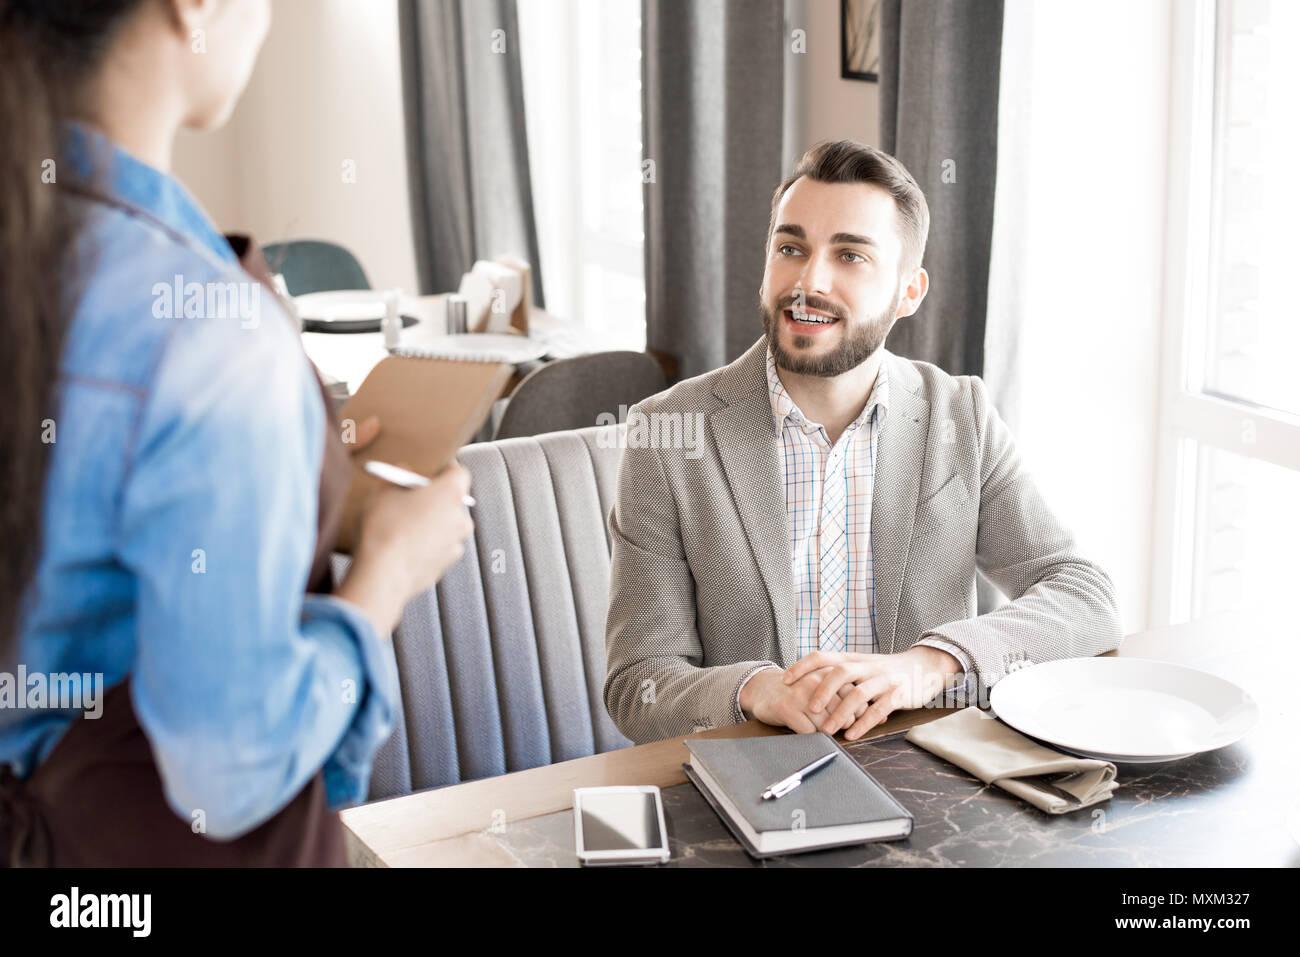 Positive businessman making order in restaurant - Stock Image